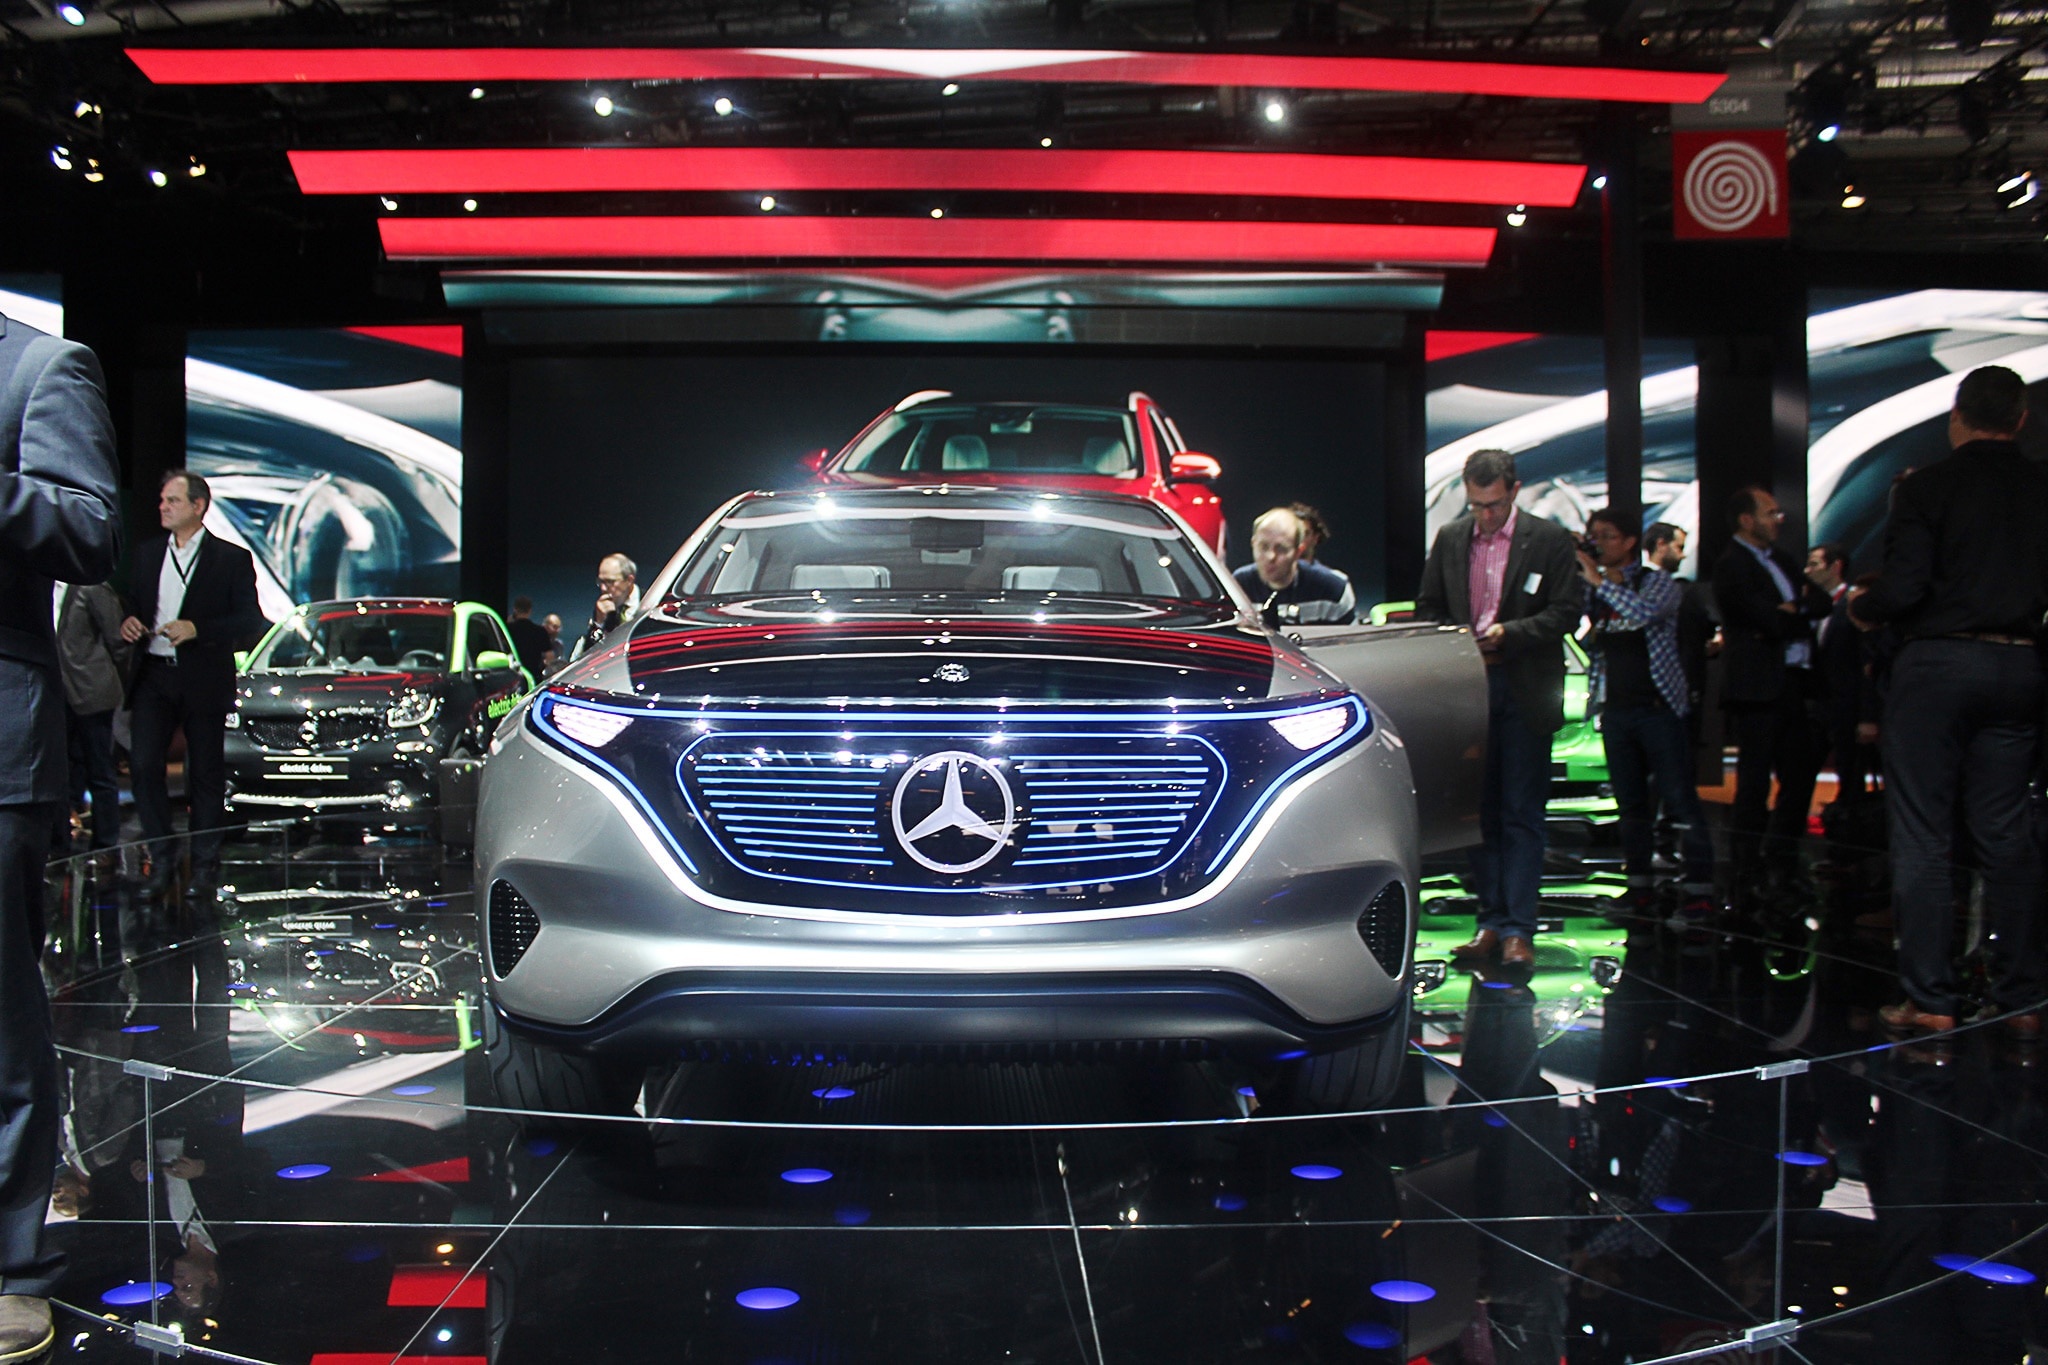 Mercedes Benz Generation EQ Concept Front View